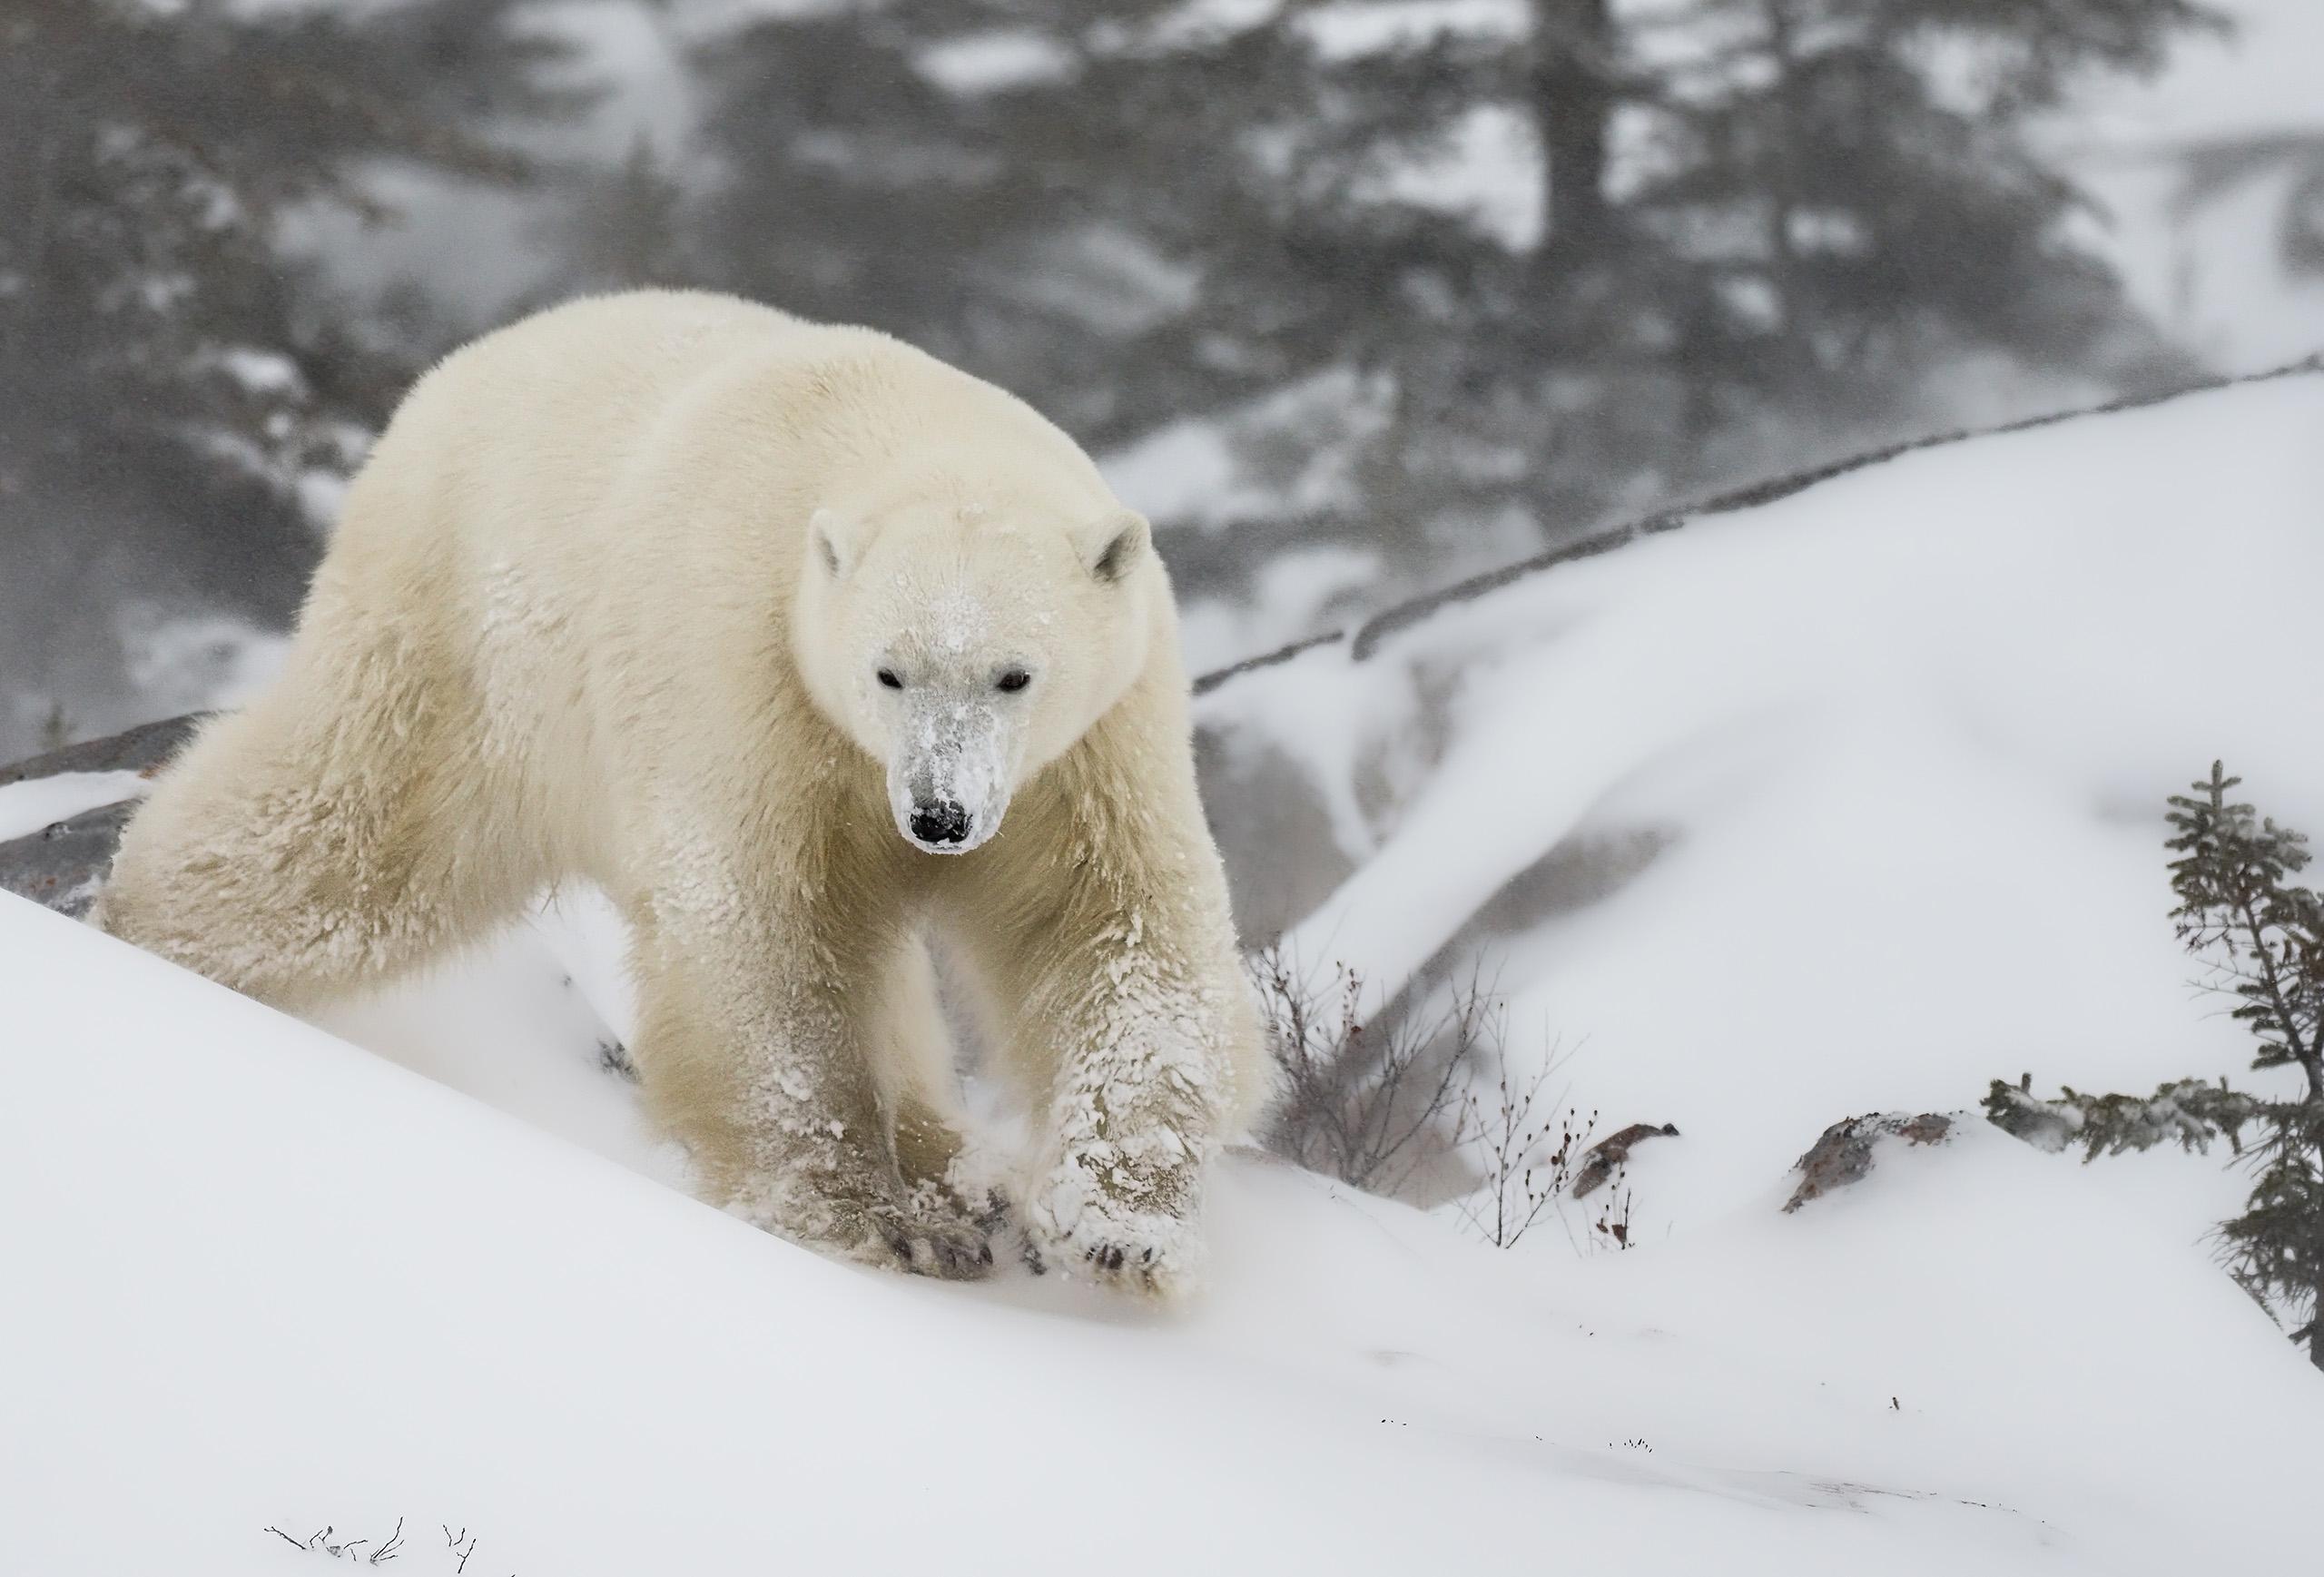 Polar bear walking through snow, photographed using Olympus OM-D E-M1 Mk III + M.Zuiko Digital ED 300mm f4 PRO lens